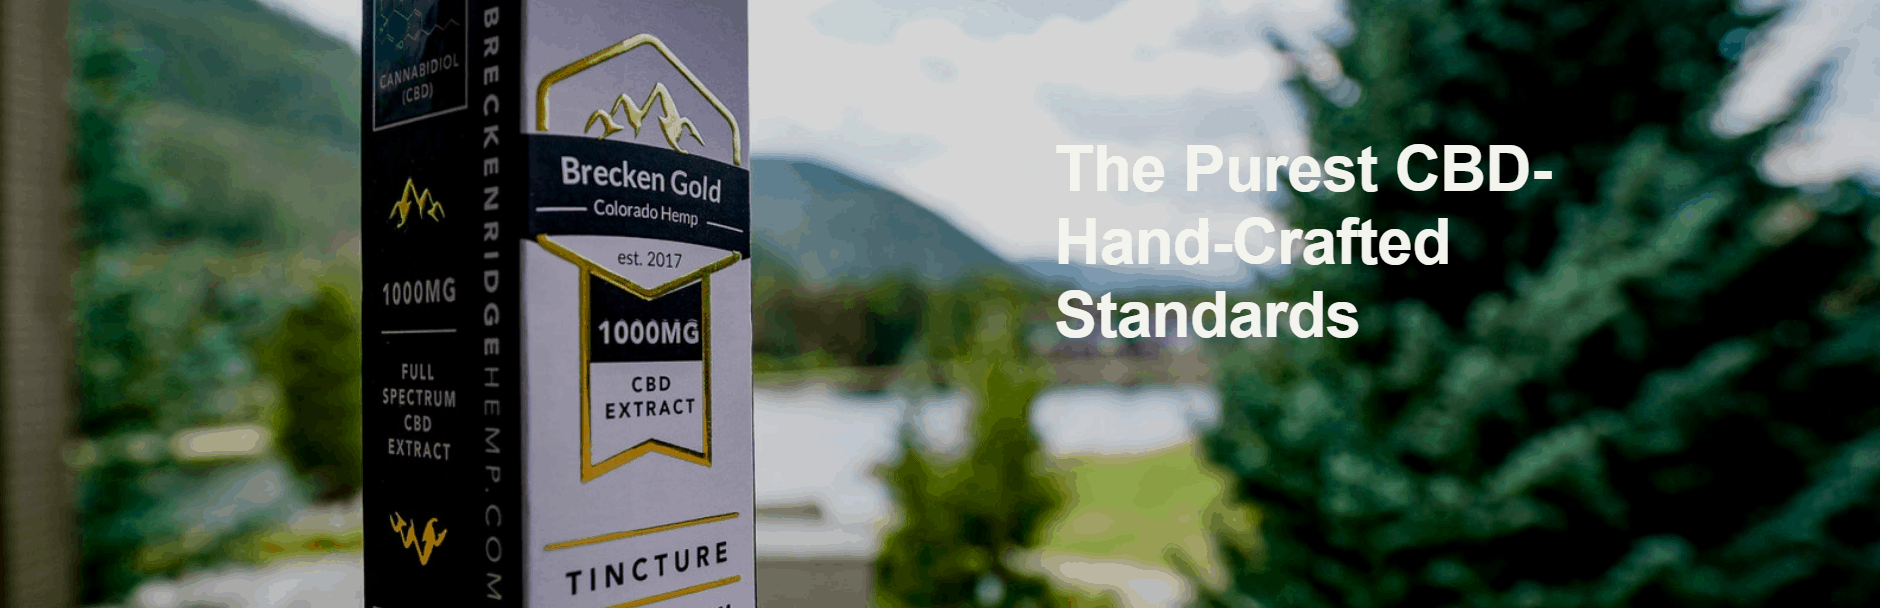 The Breckenridge Hemp Co Brecken Gold CBD Coupons Pure Products